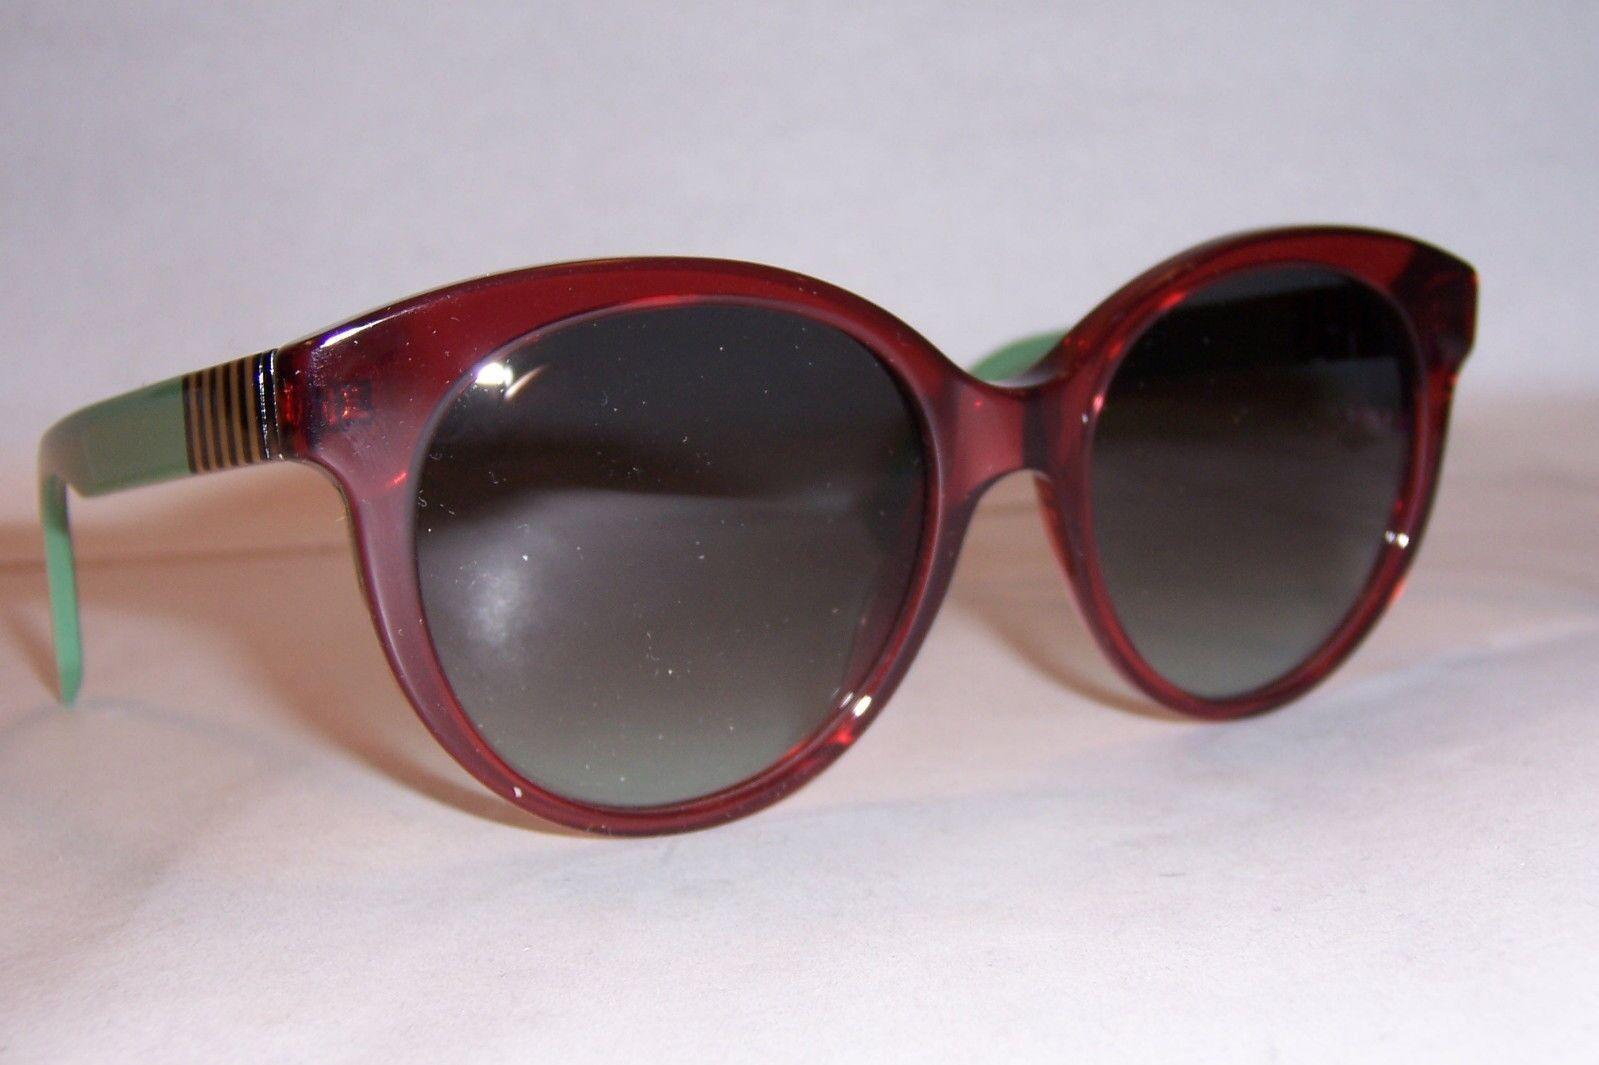 b5724a2a2a8 Fendi 0013 s 07ti PL Burgundy Womens Sunglasses for sale online